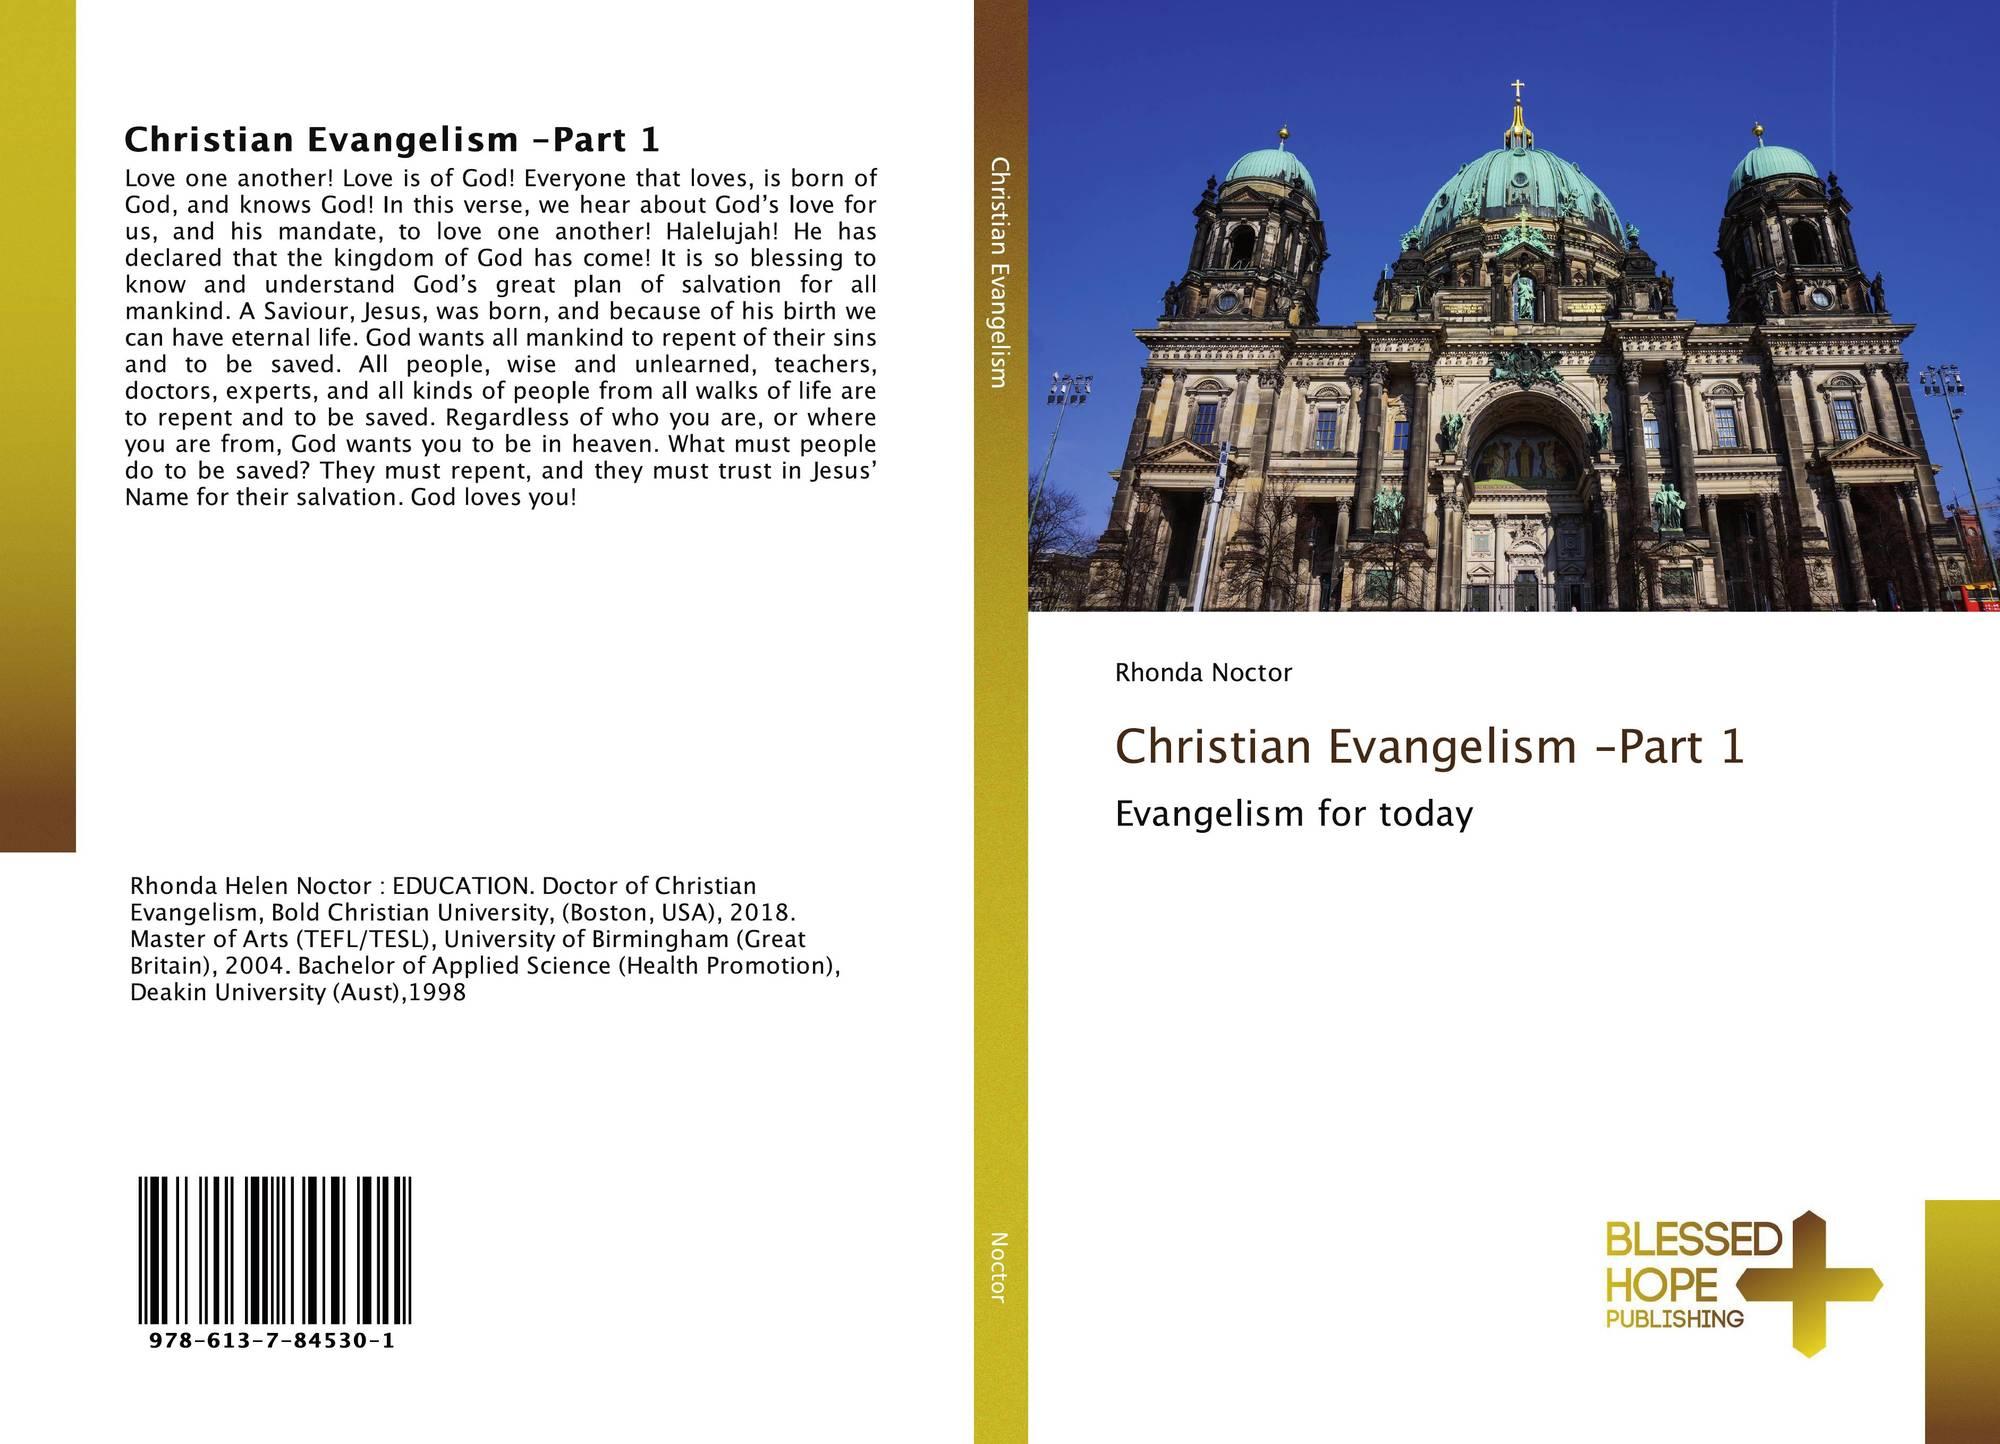 Divine Appointments in Evangelism Part 1